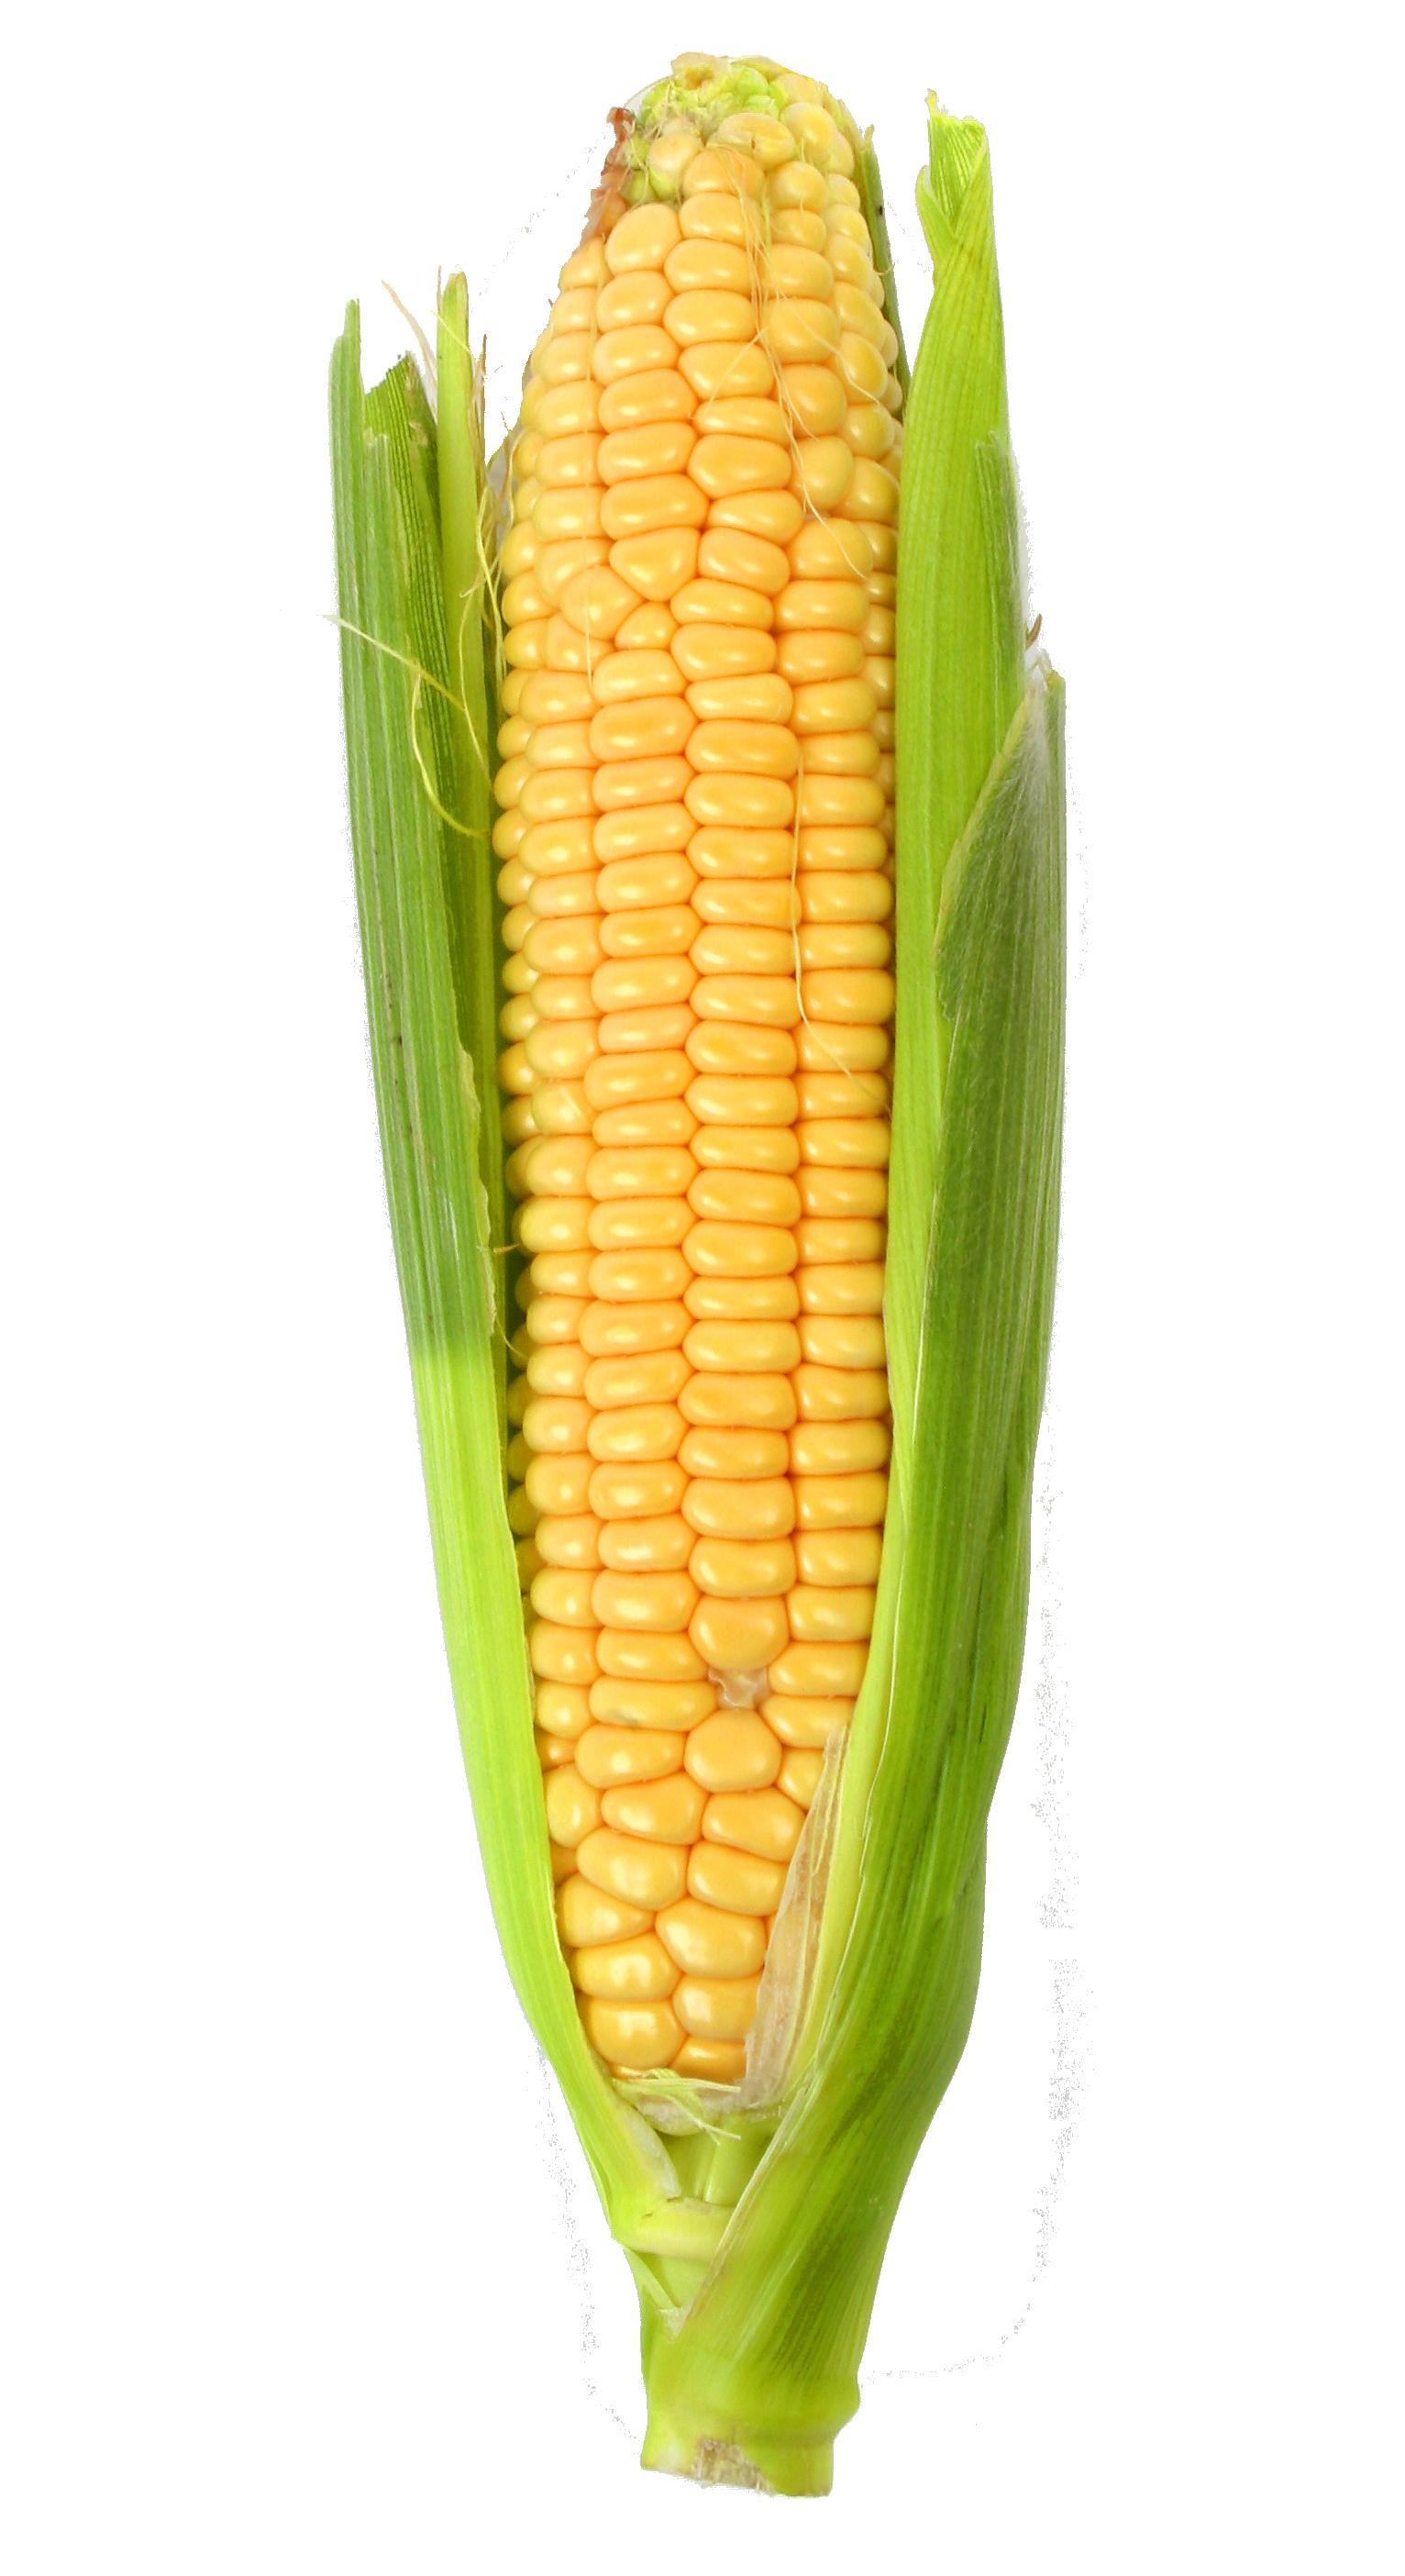 Corn PNG Image Corn, Popcorn seeds, Image